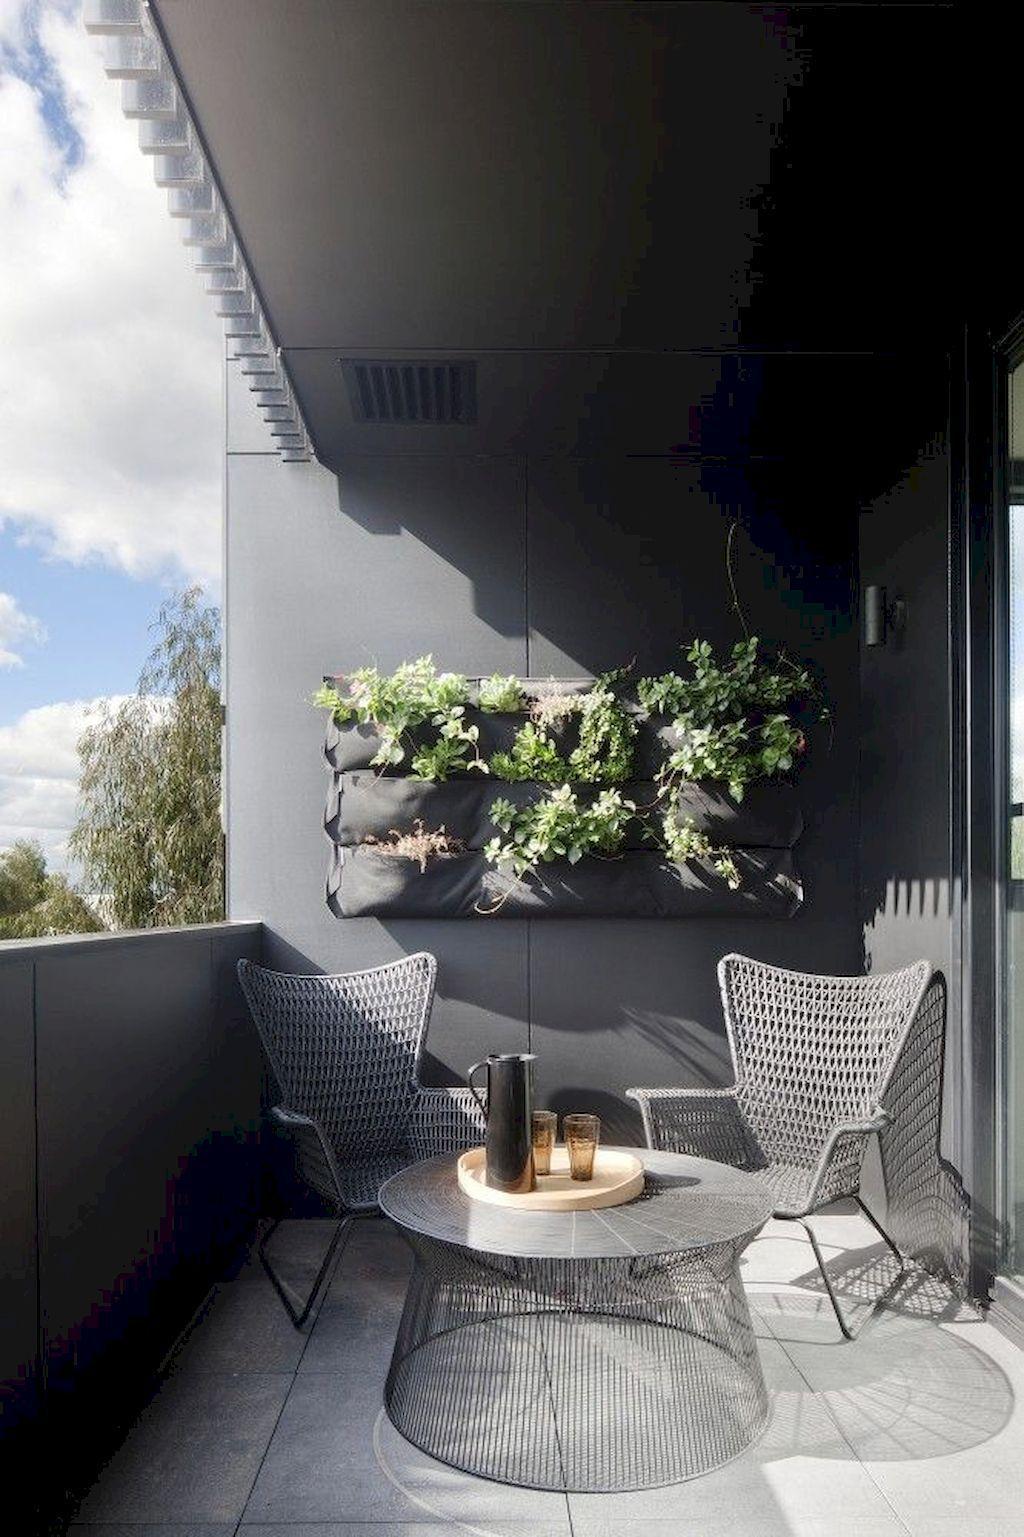 54 Cozy Apartment Balcony Decorating Ideas Small Apartment Balcony Ideas Small Balcony Design Balcony Decor